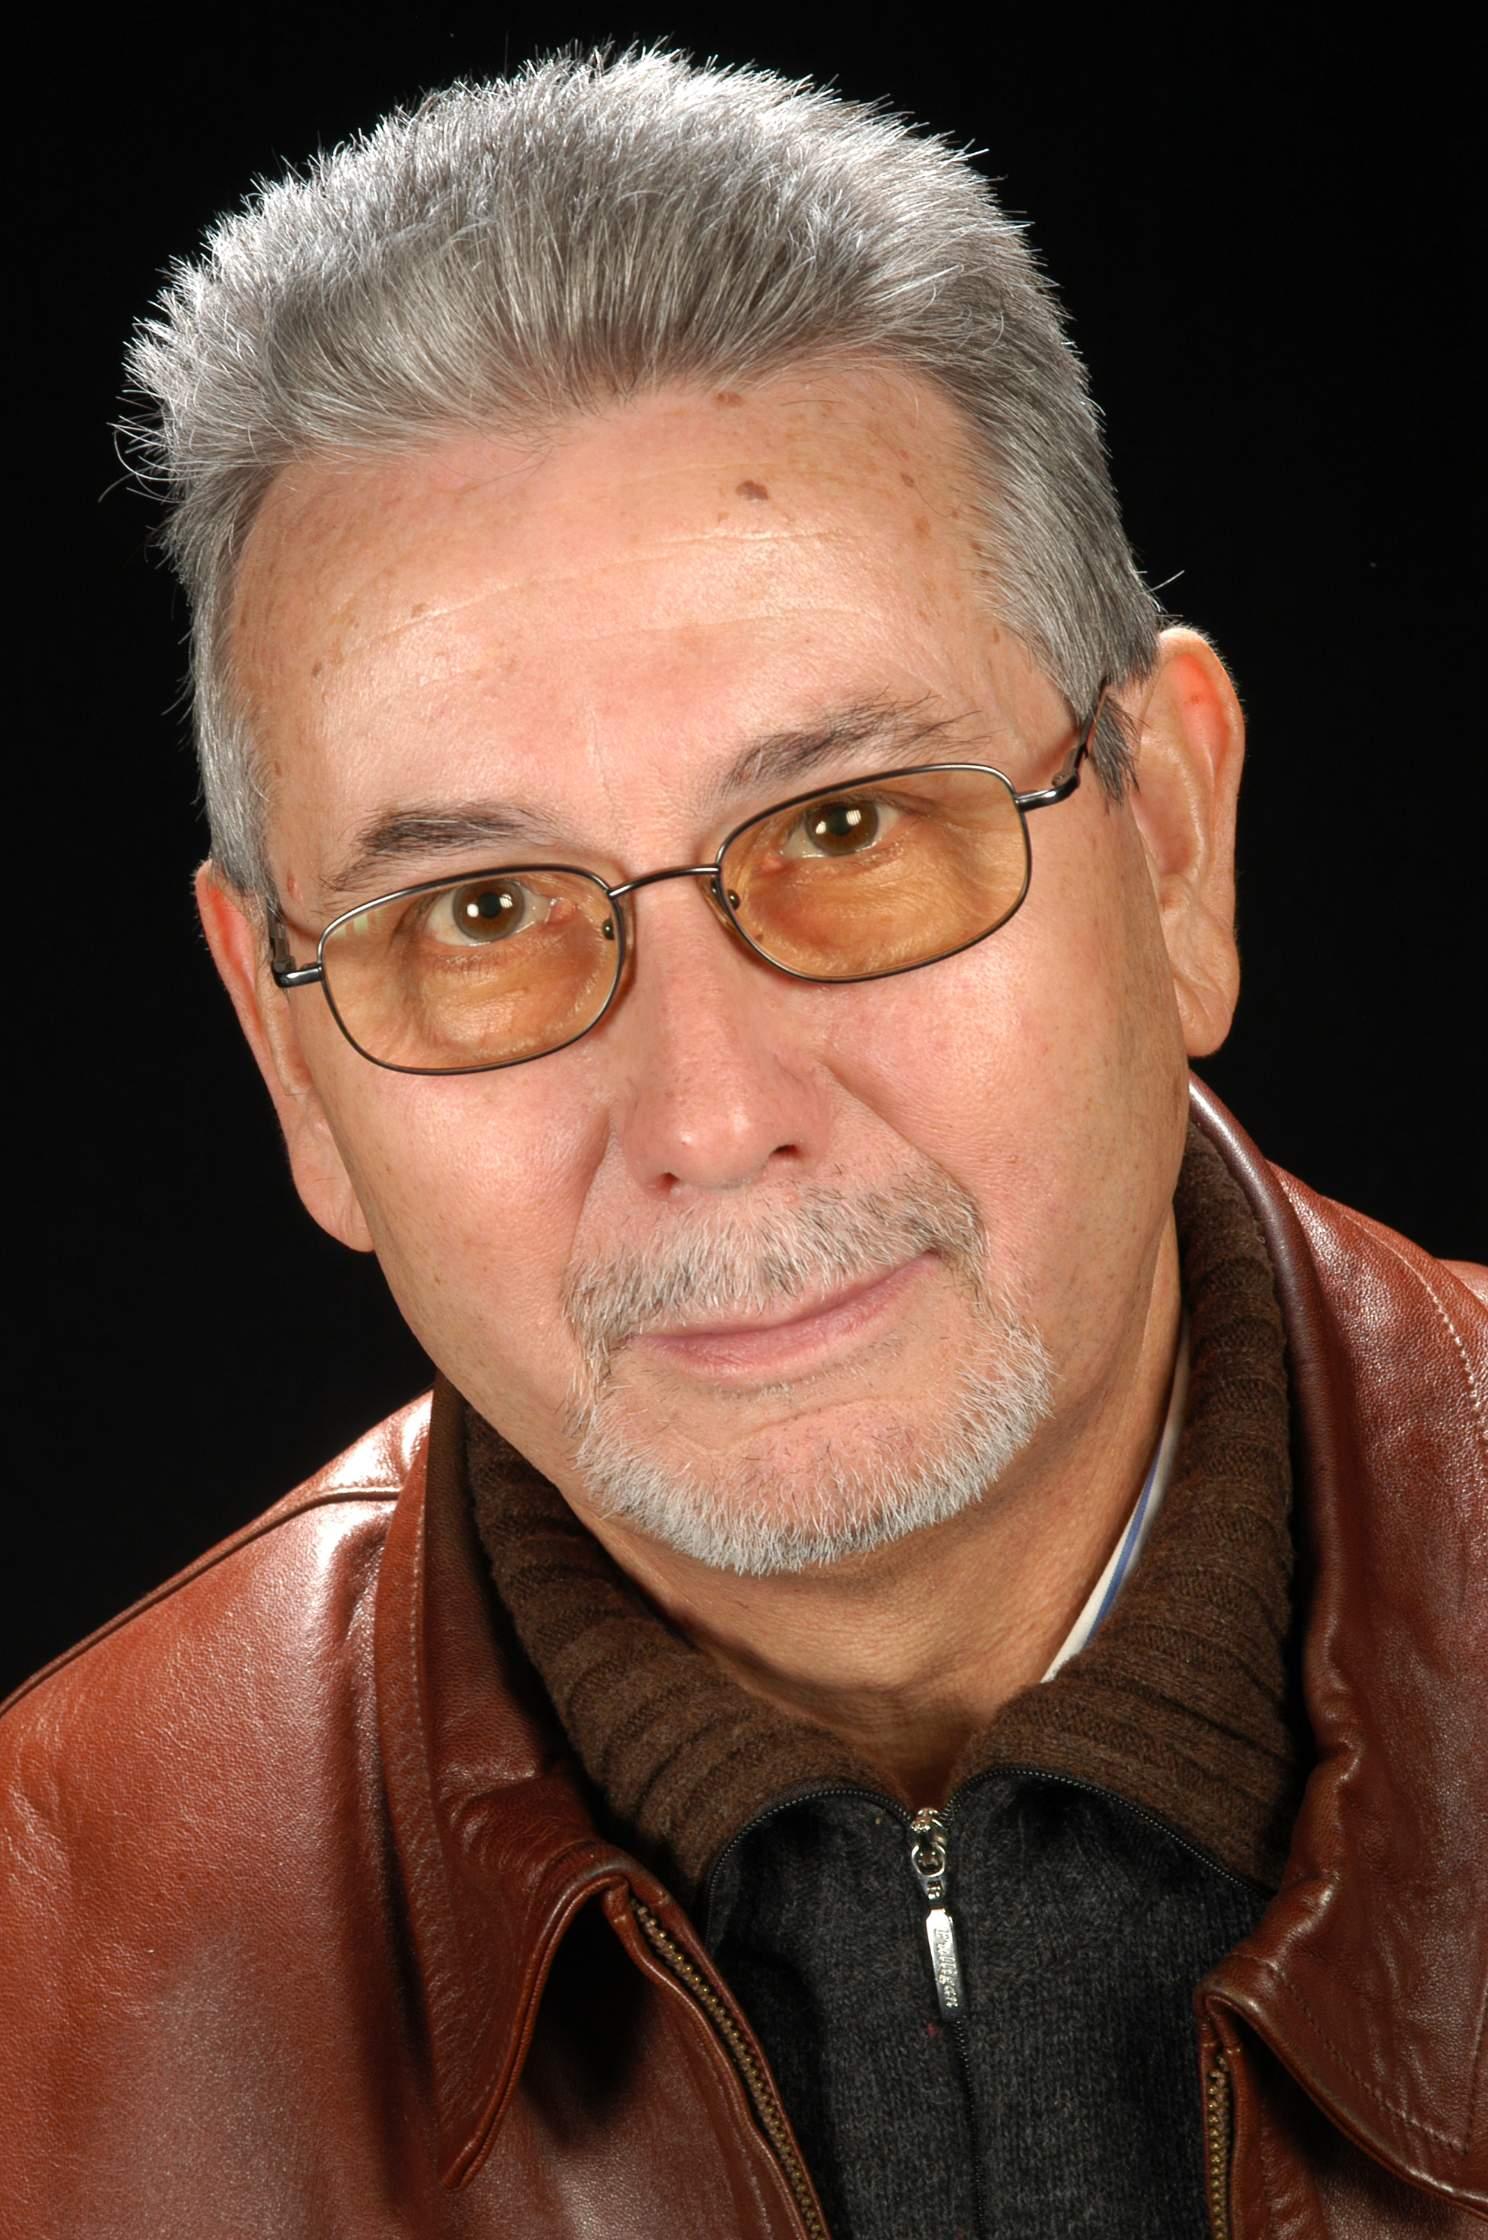 Sr. Bernardo Belmonte Mancera